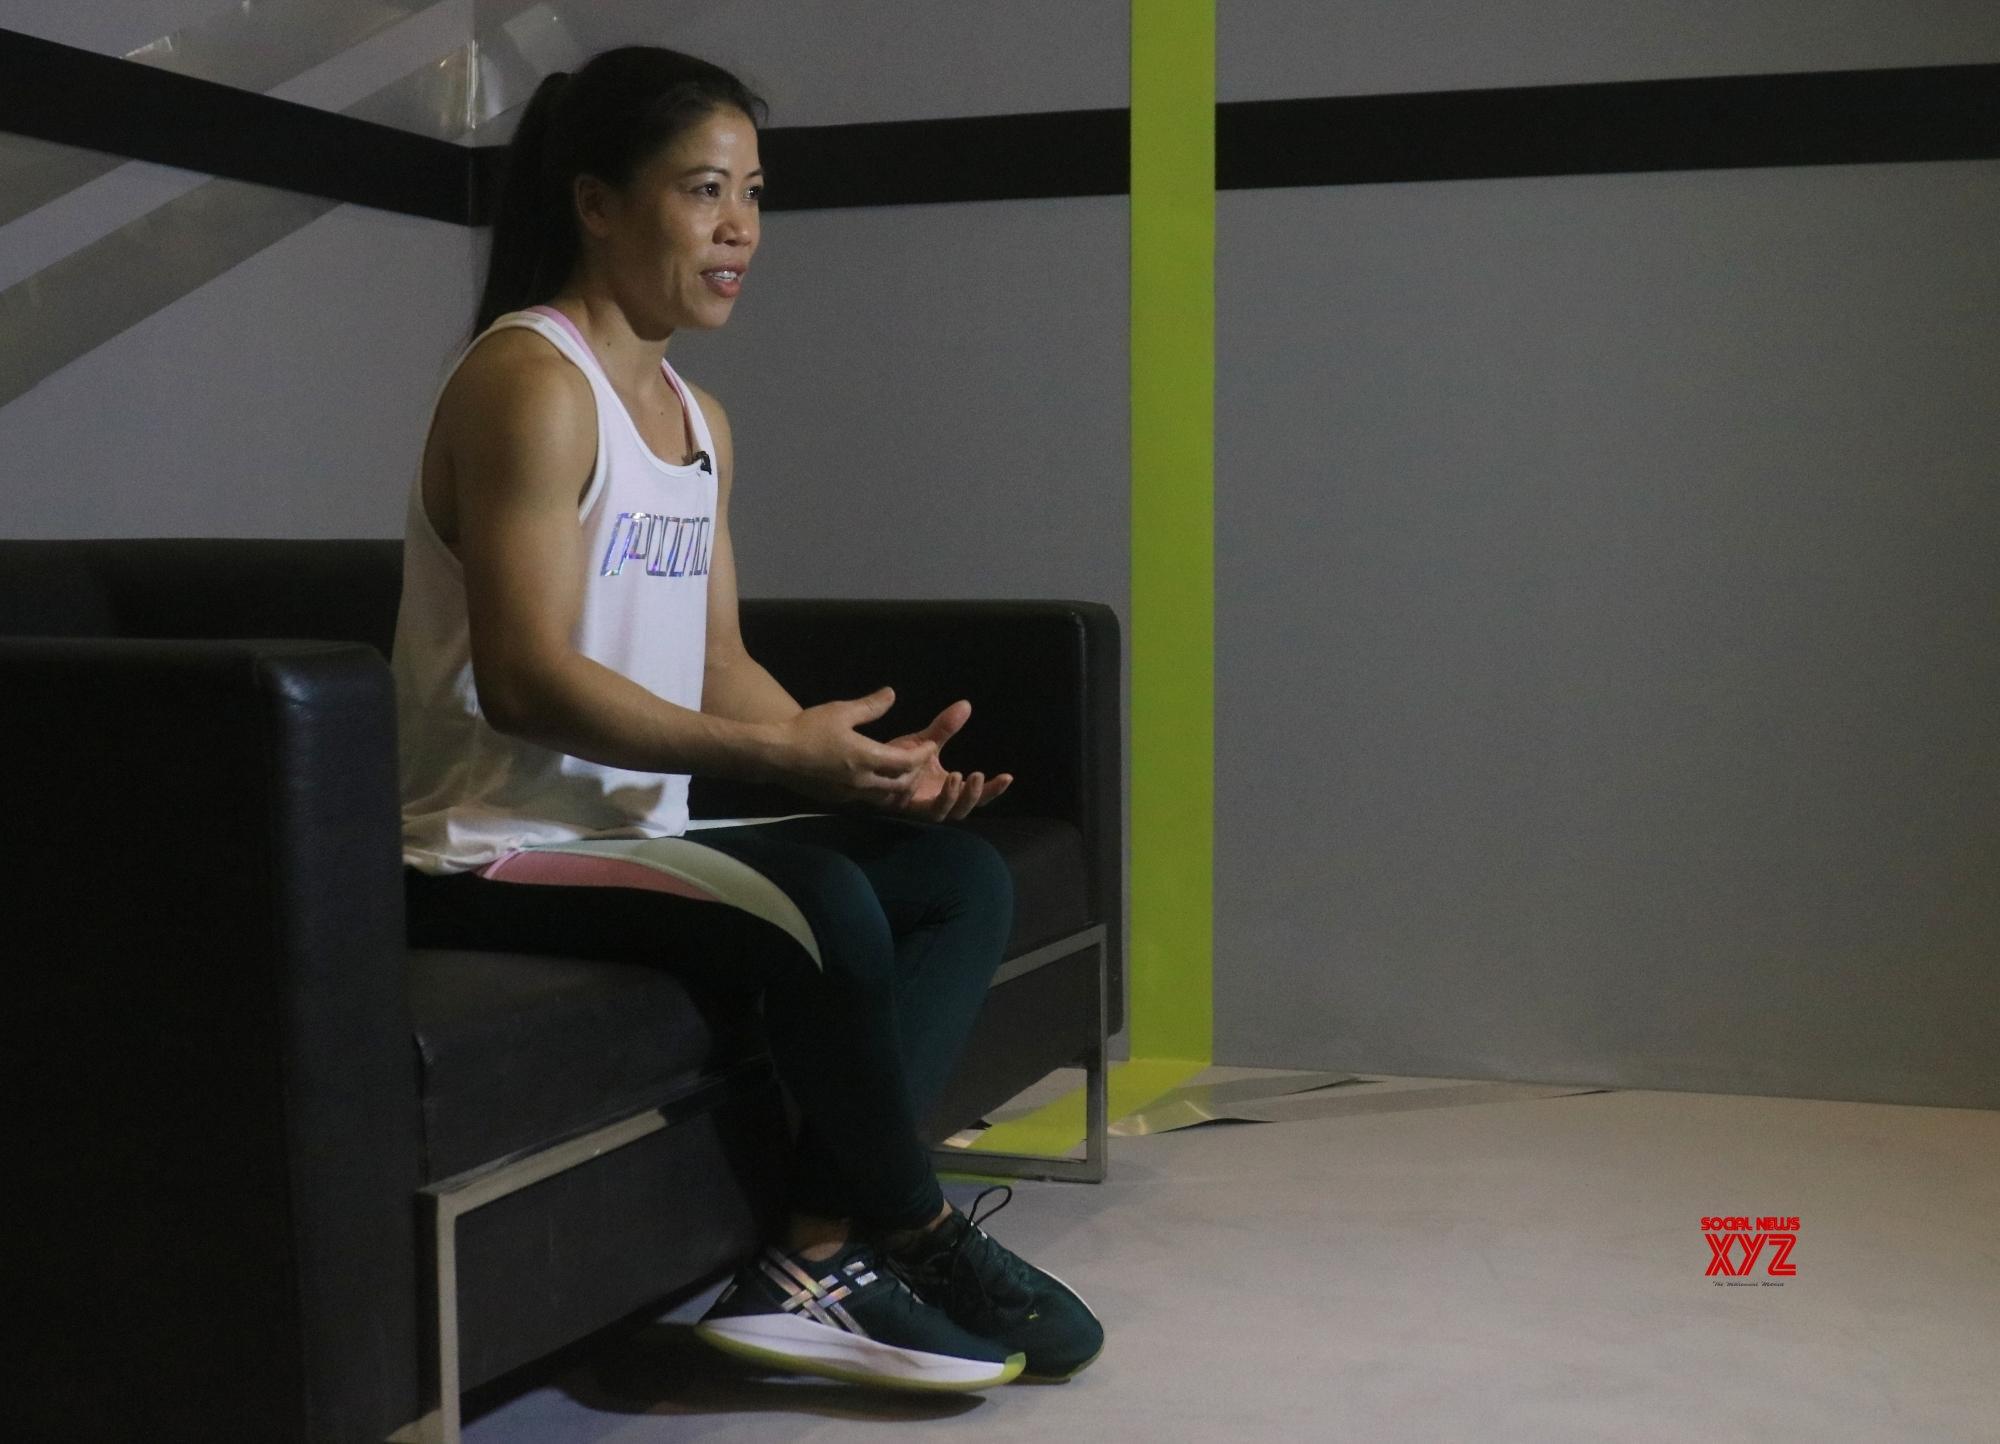 New Delhi: MC Mary Kom during a photo shoot #Gallery